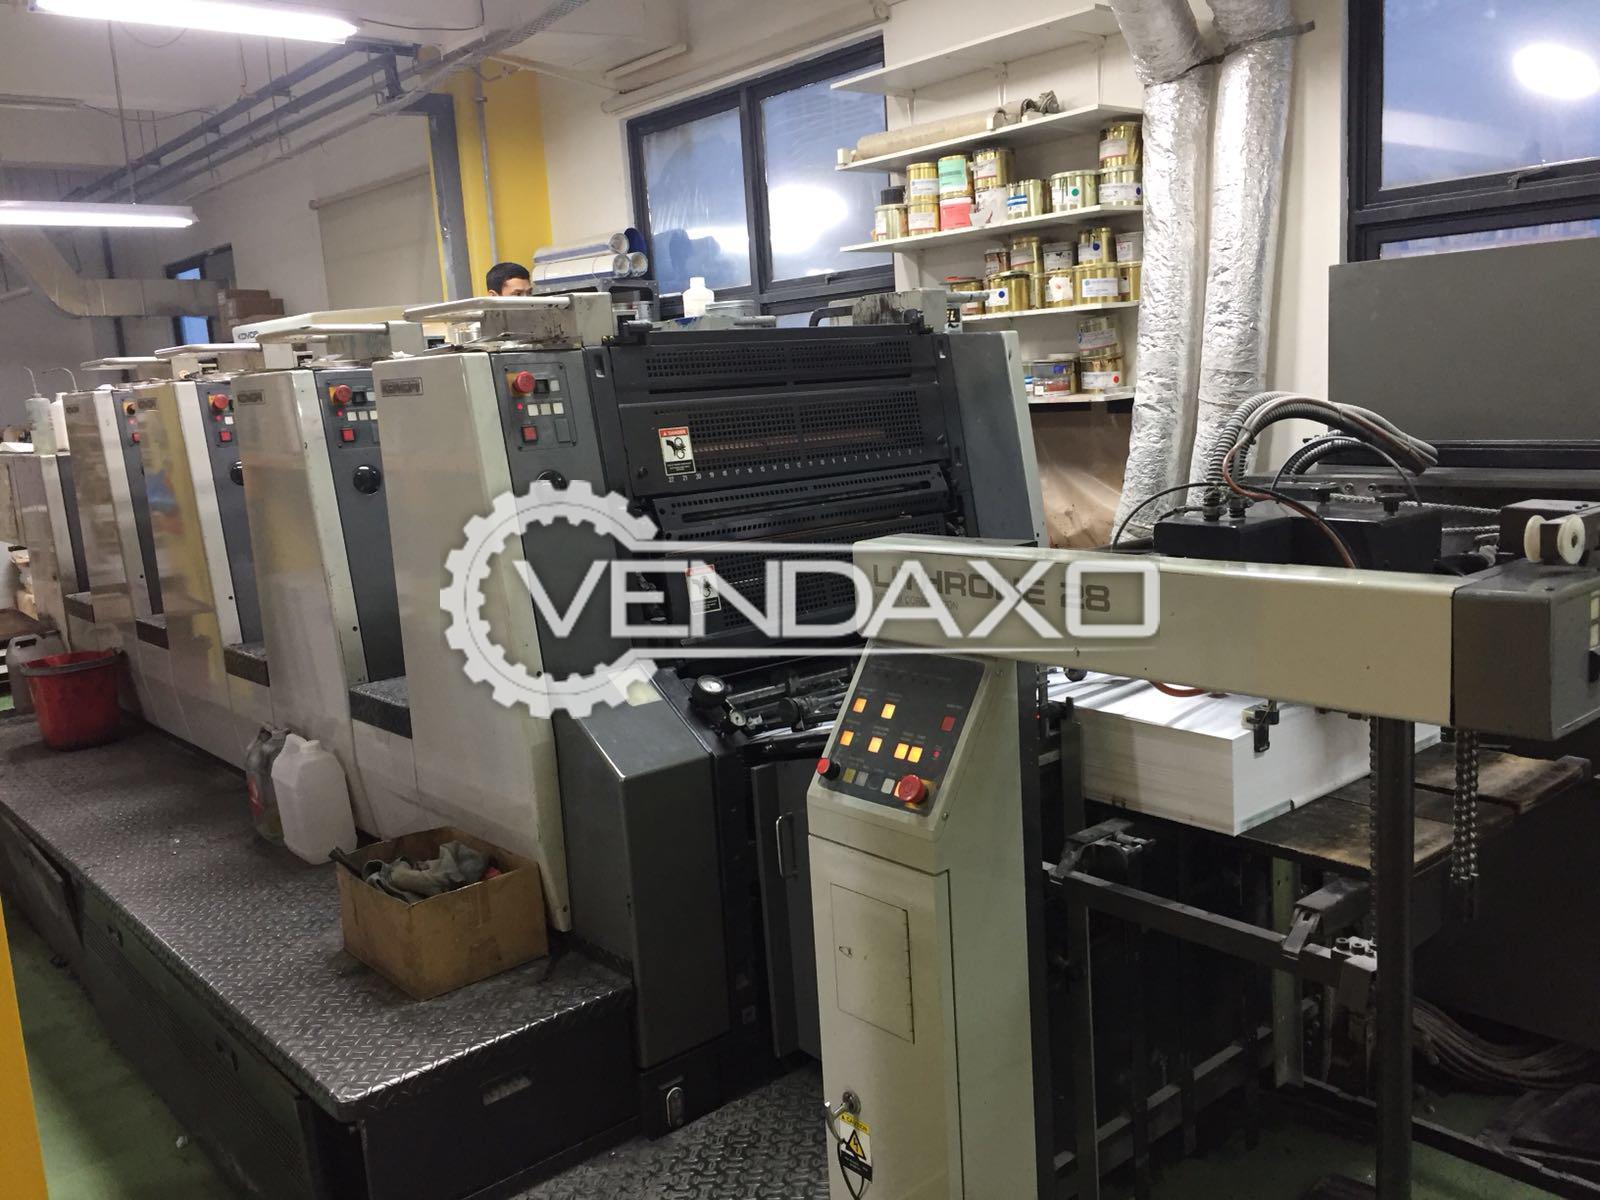 KOMORI LITHRONE 428 Offset Printing Machine - 4 Color